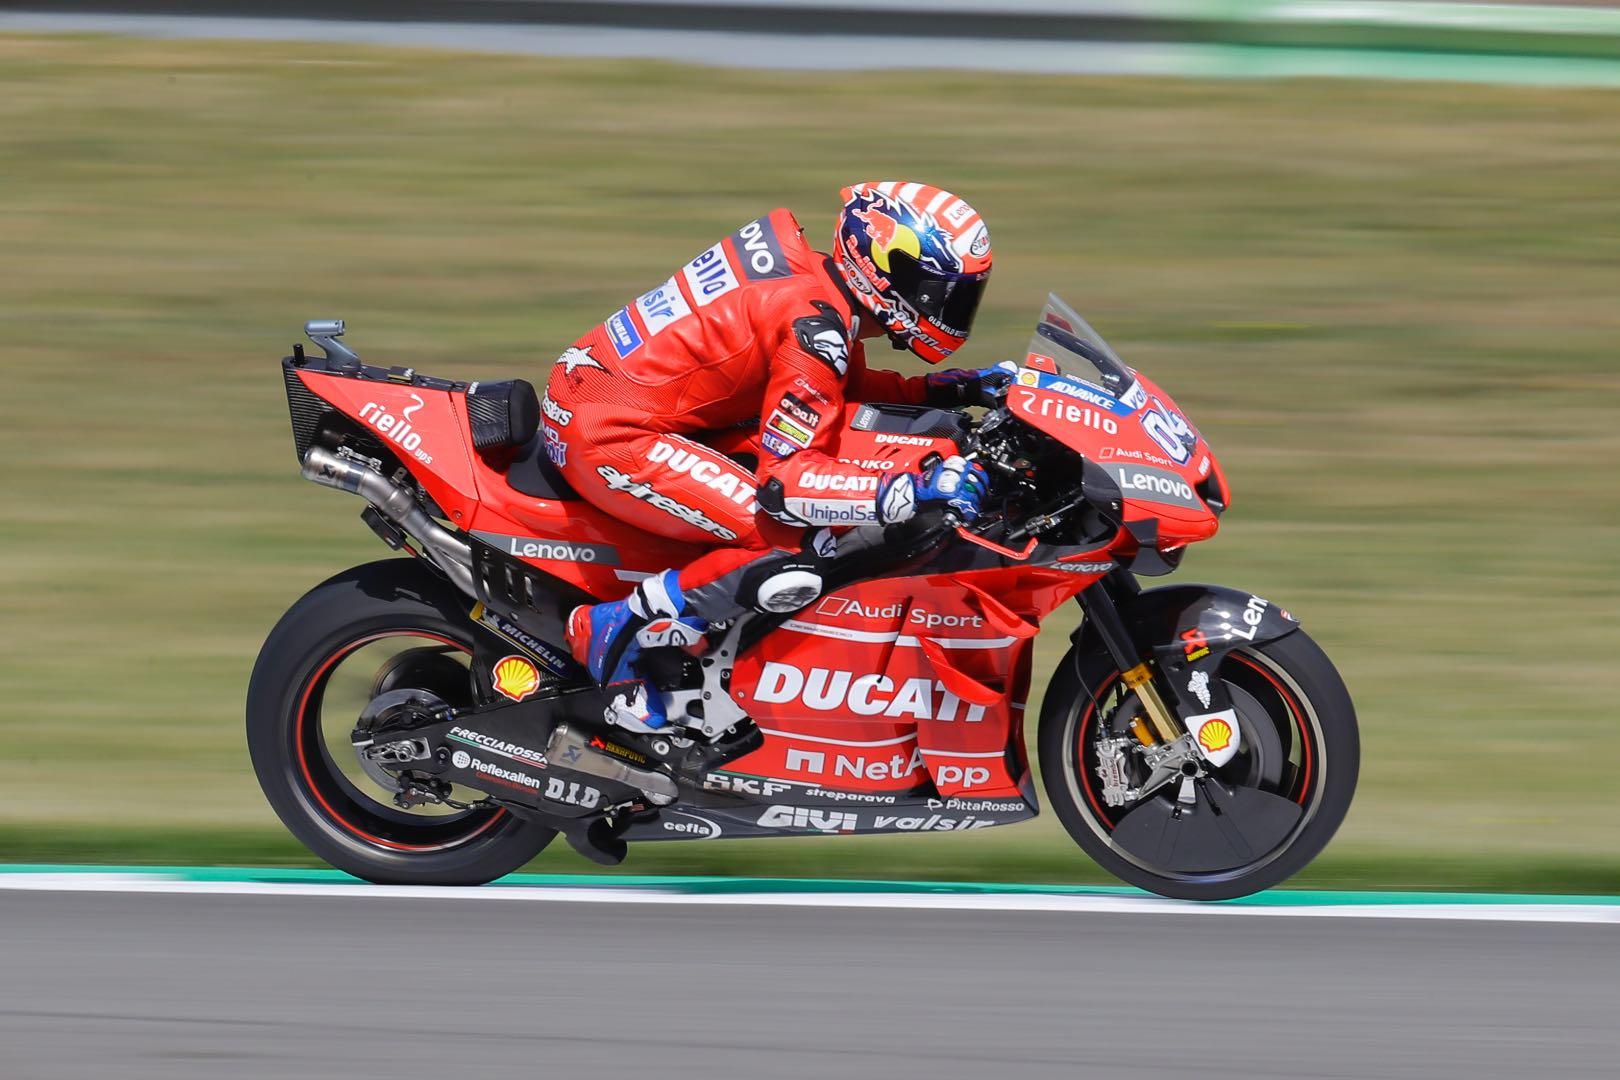 Ducati's Dovizioso at Assen MotoGP 2019